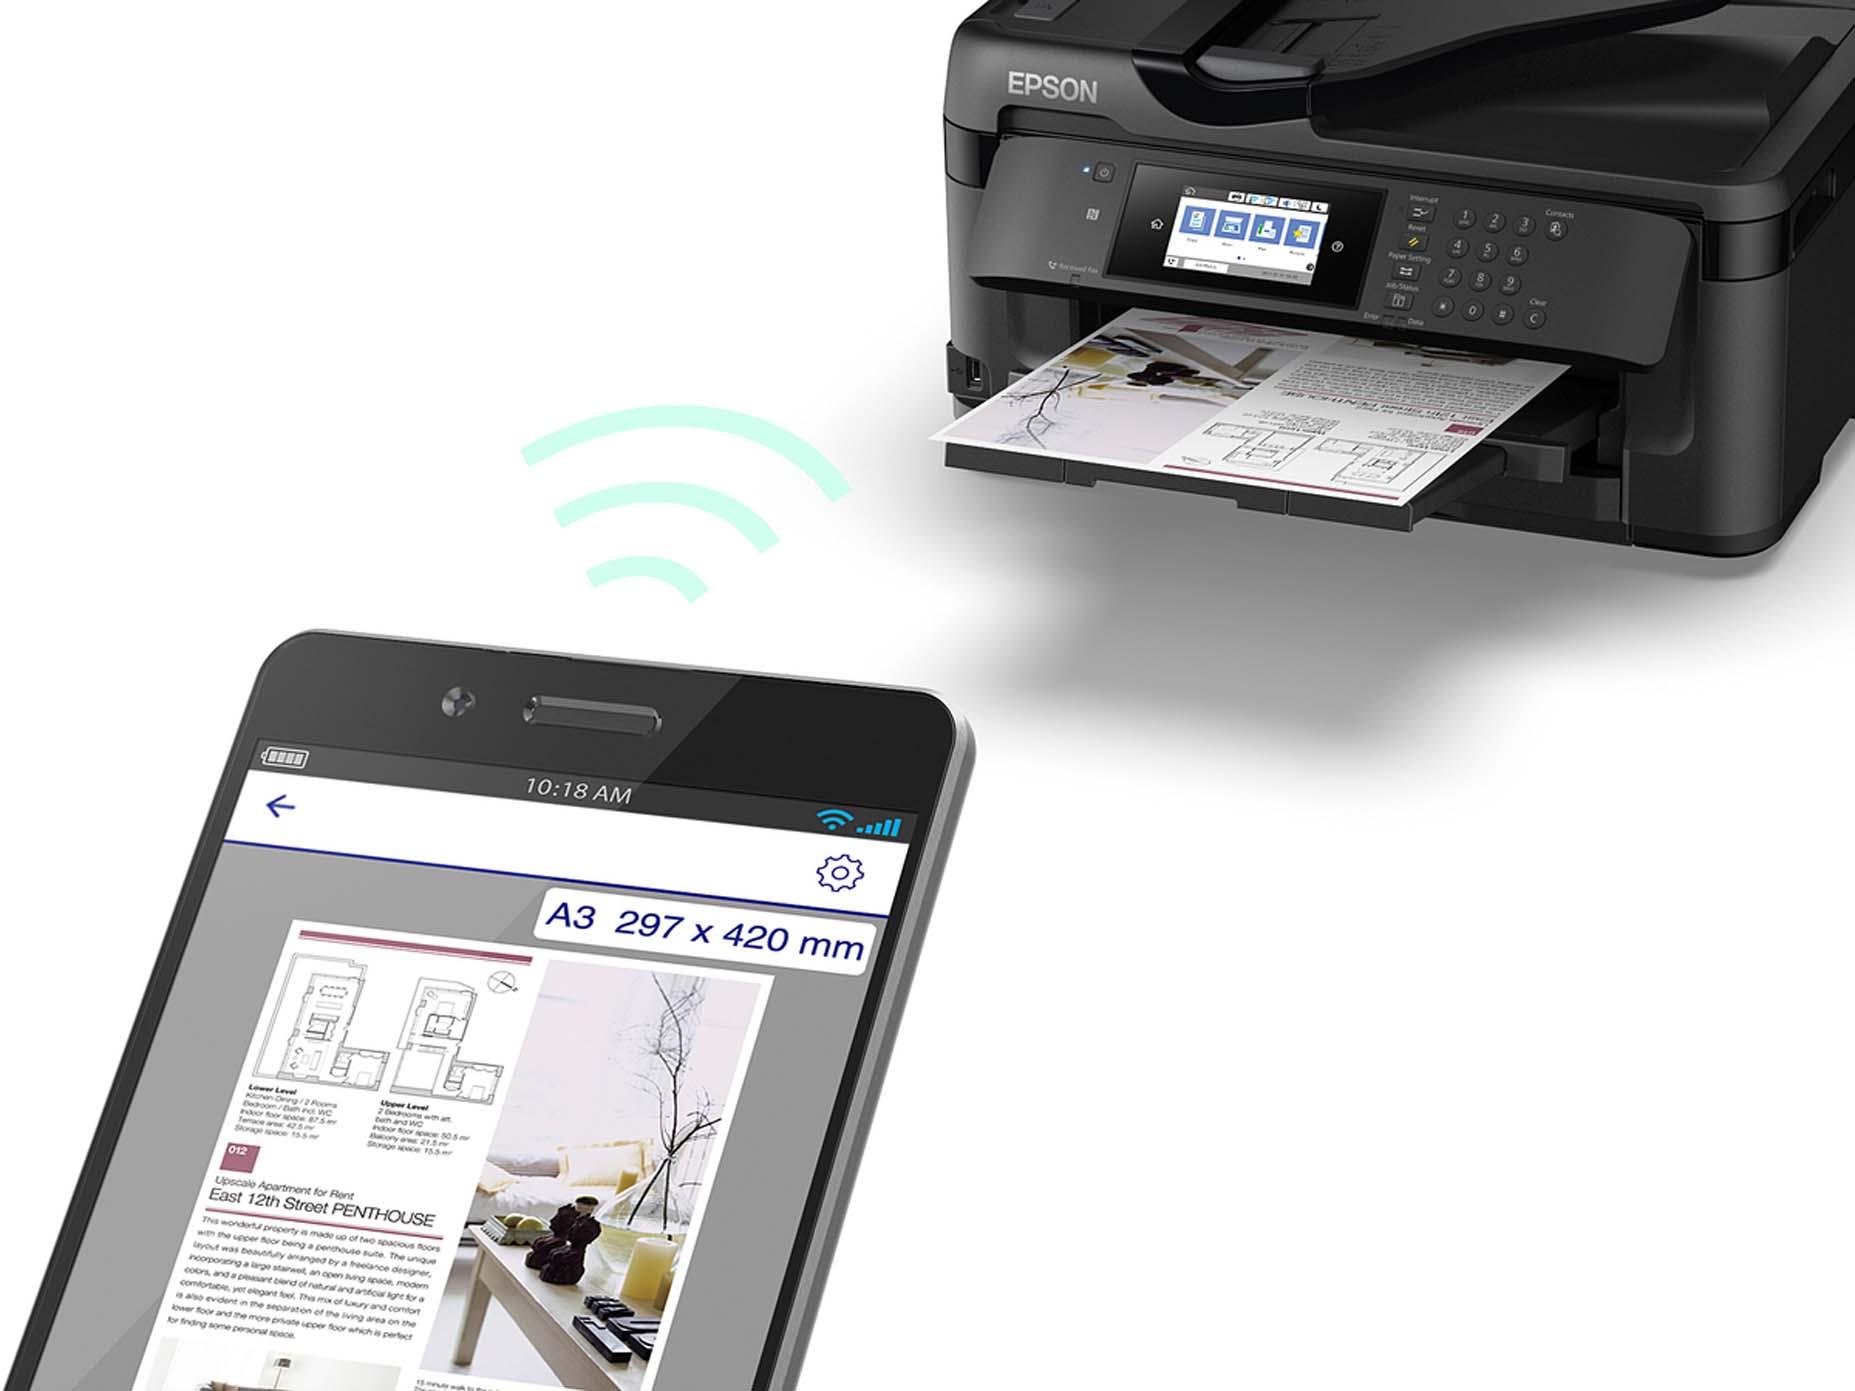 Harga Jual Epson Workforce Wf 7711 Printer A3